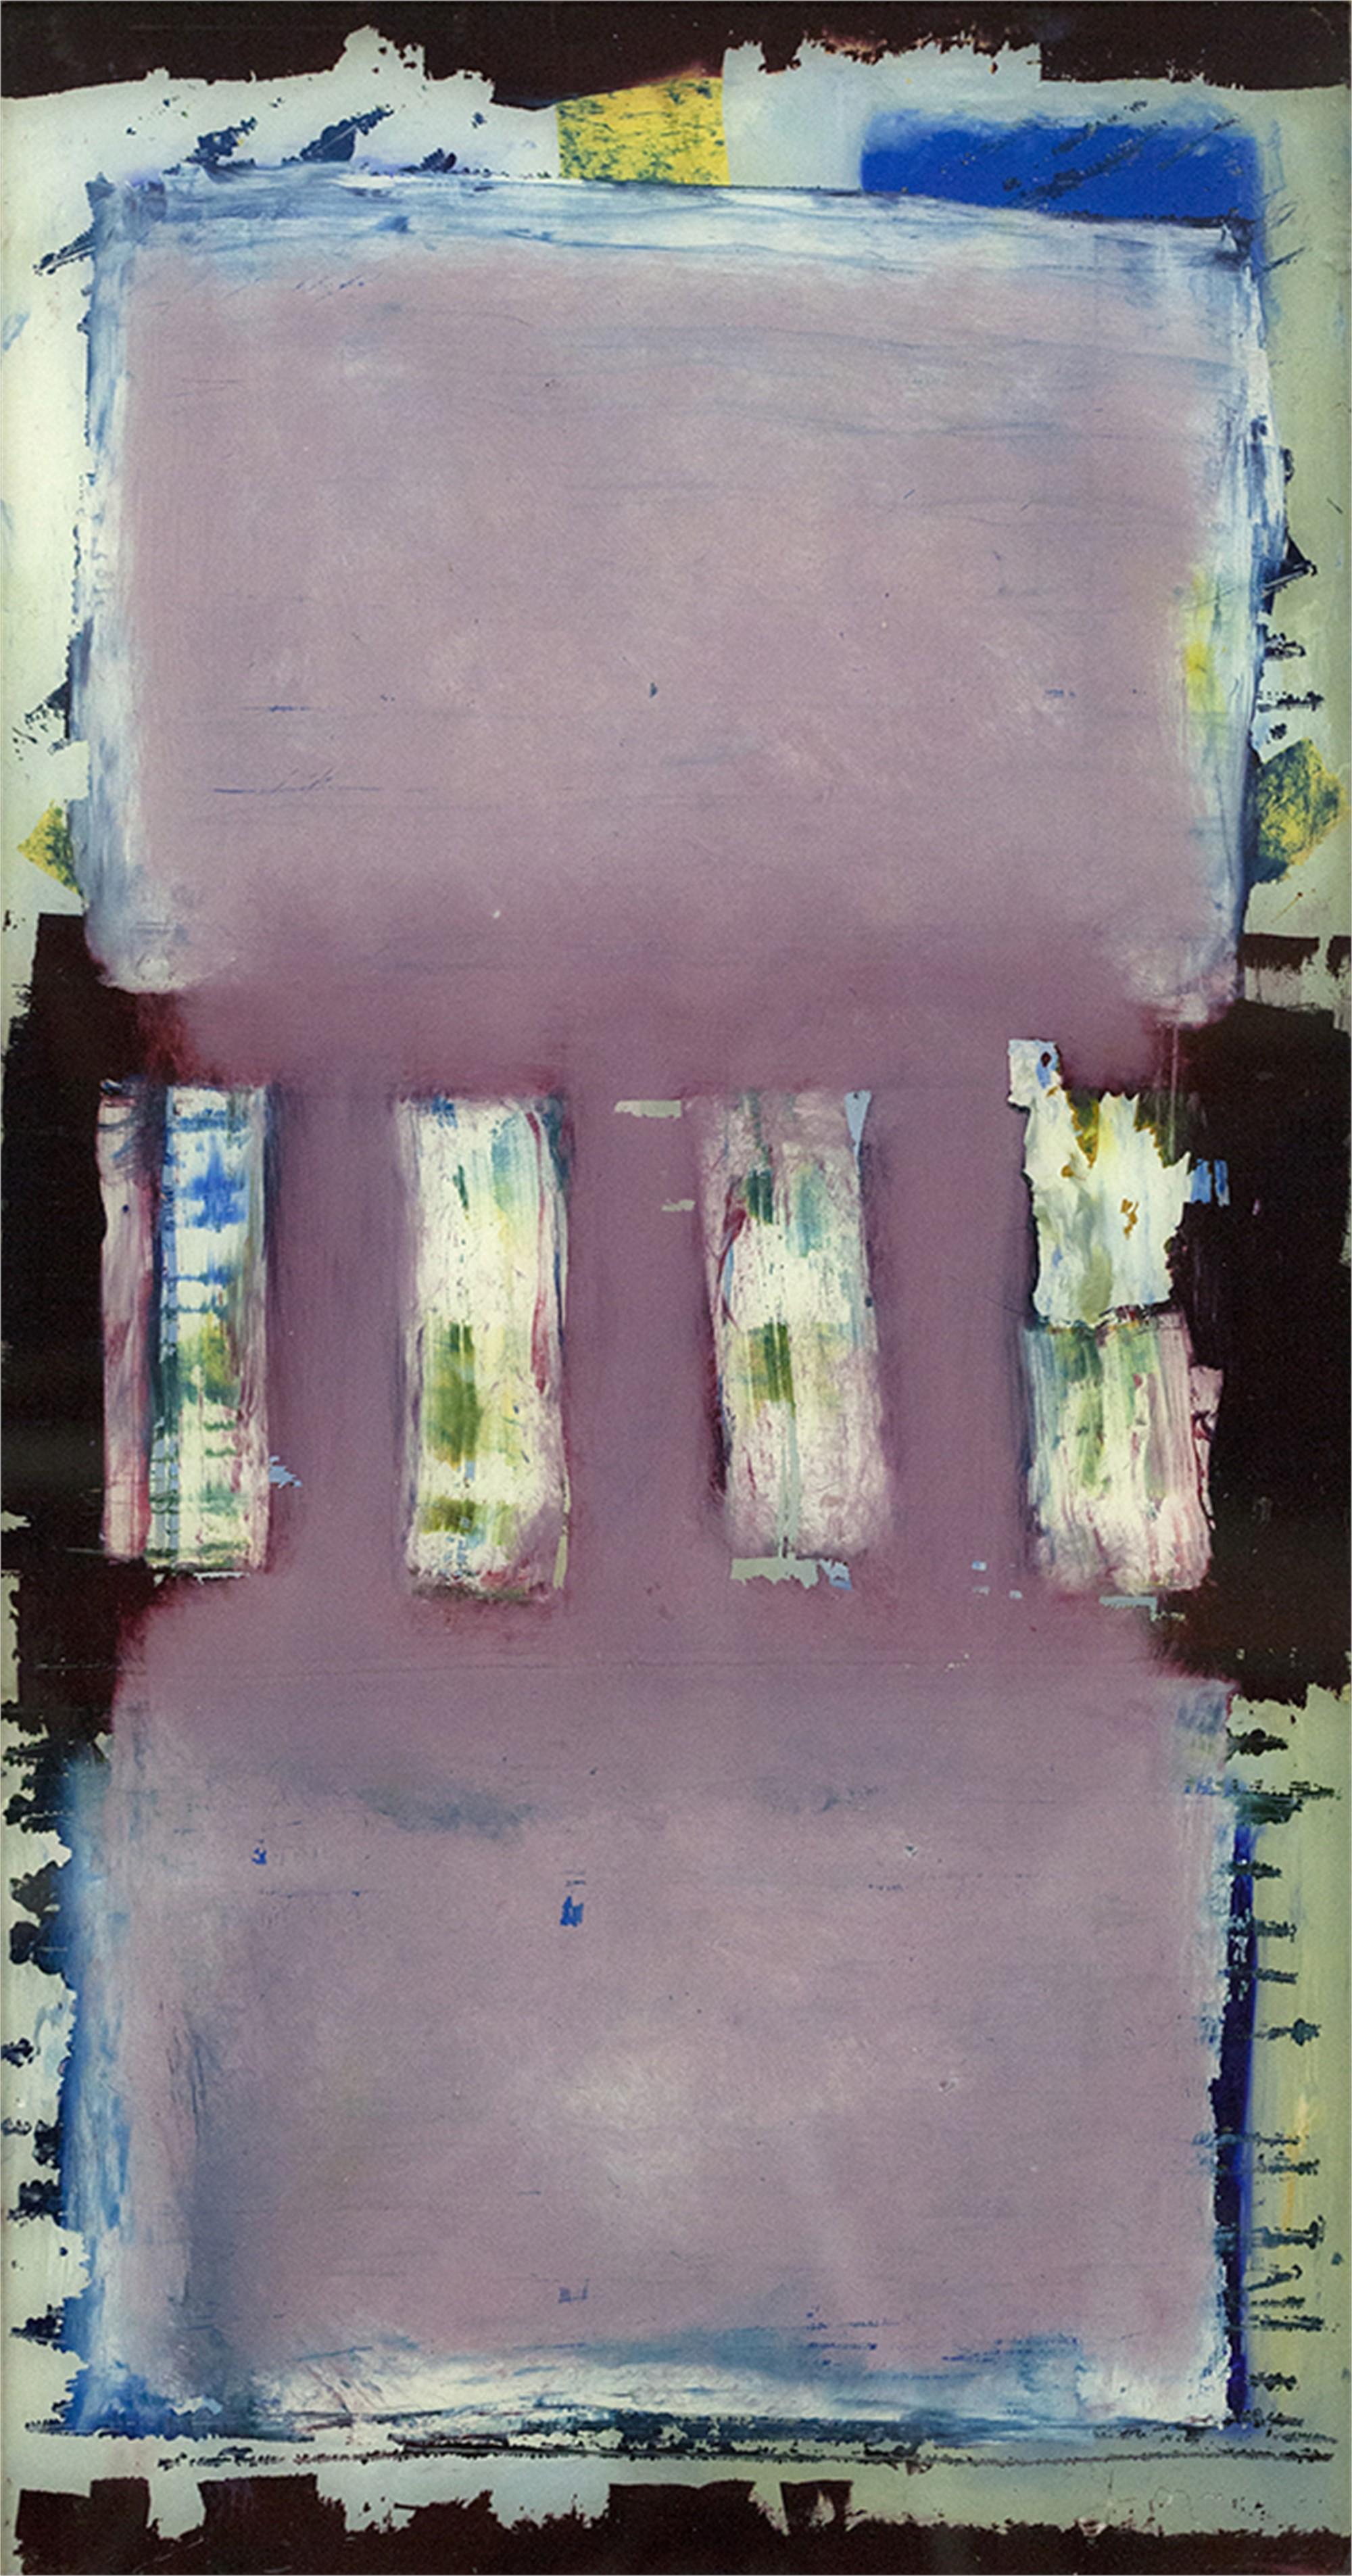 Peppermint Pink by John McCaw